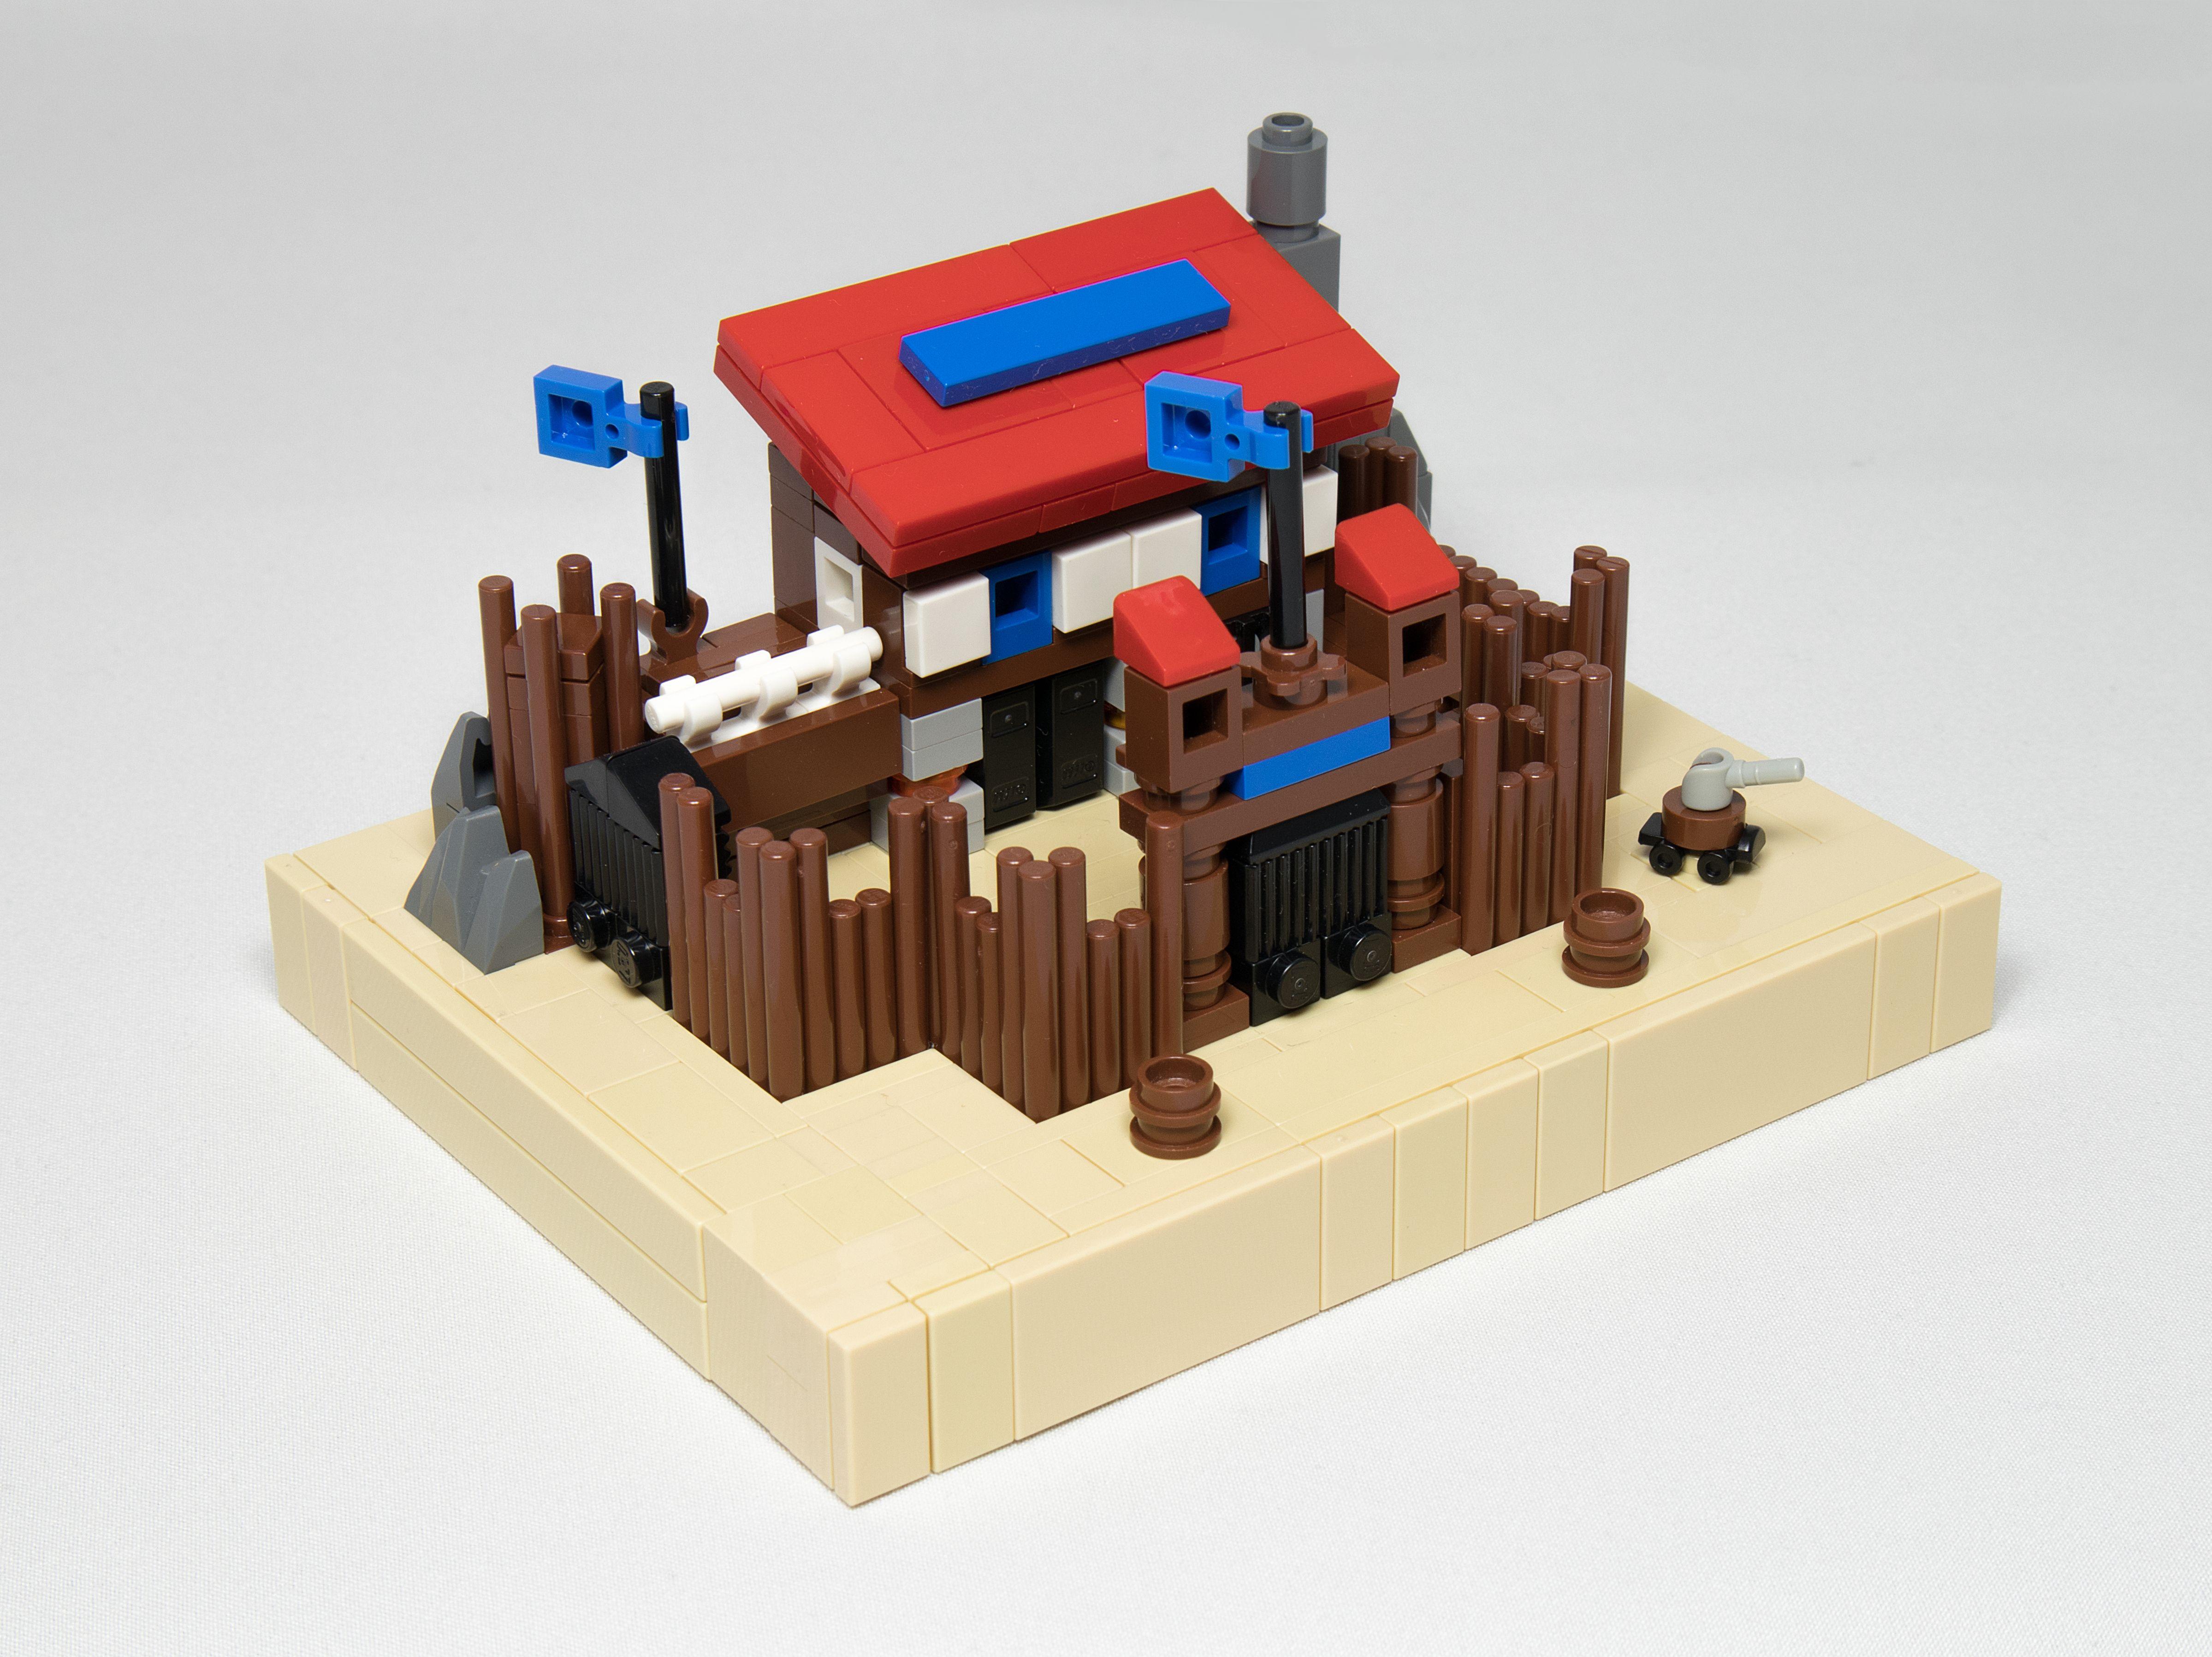 Concurs Santa's Gifts – Creatia 2: Fort Legoredo